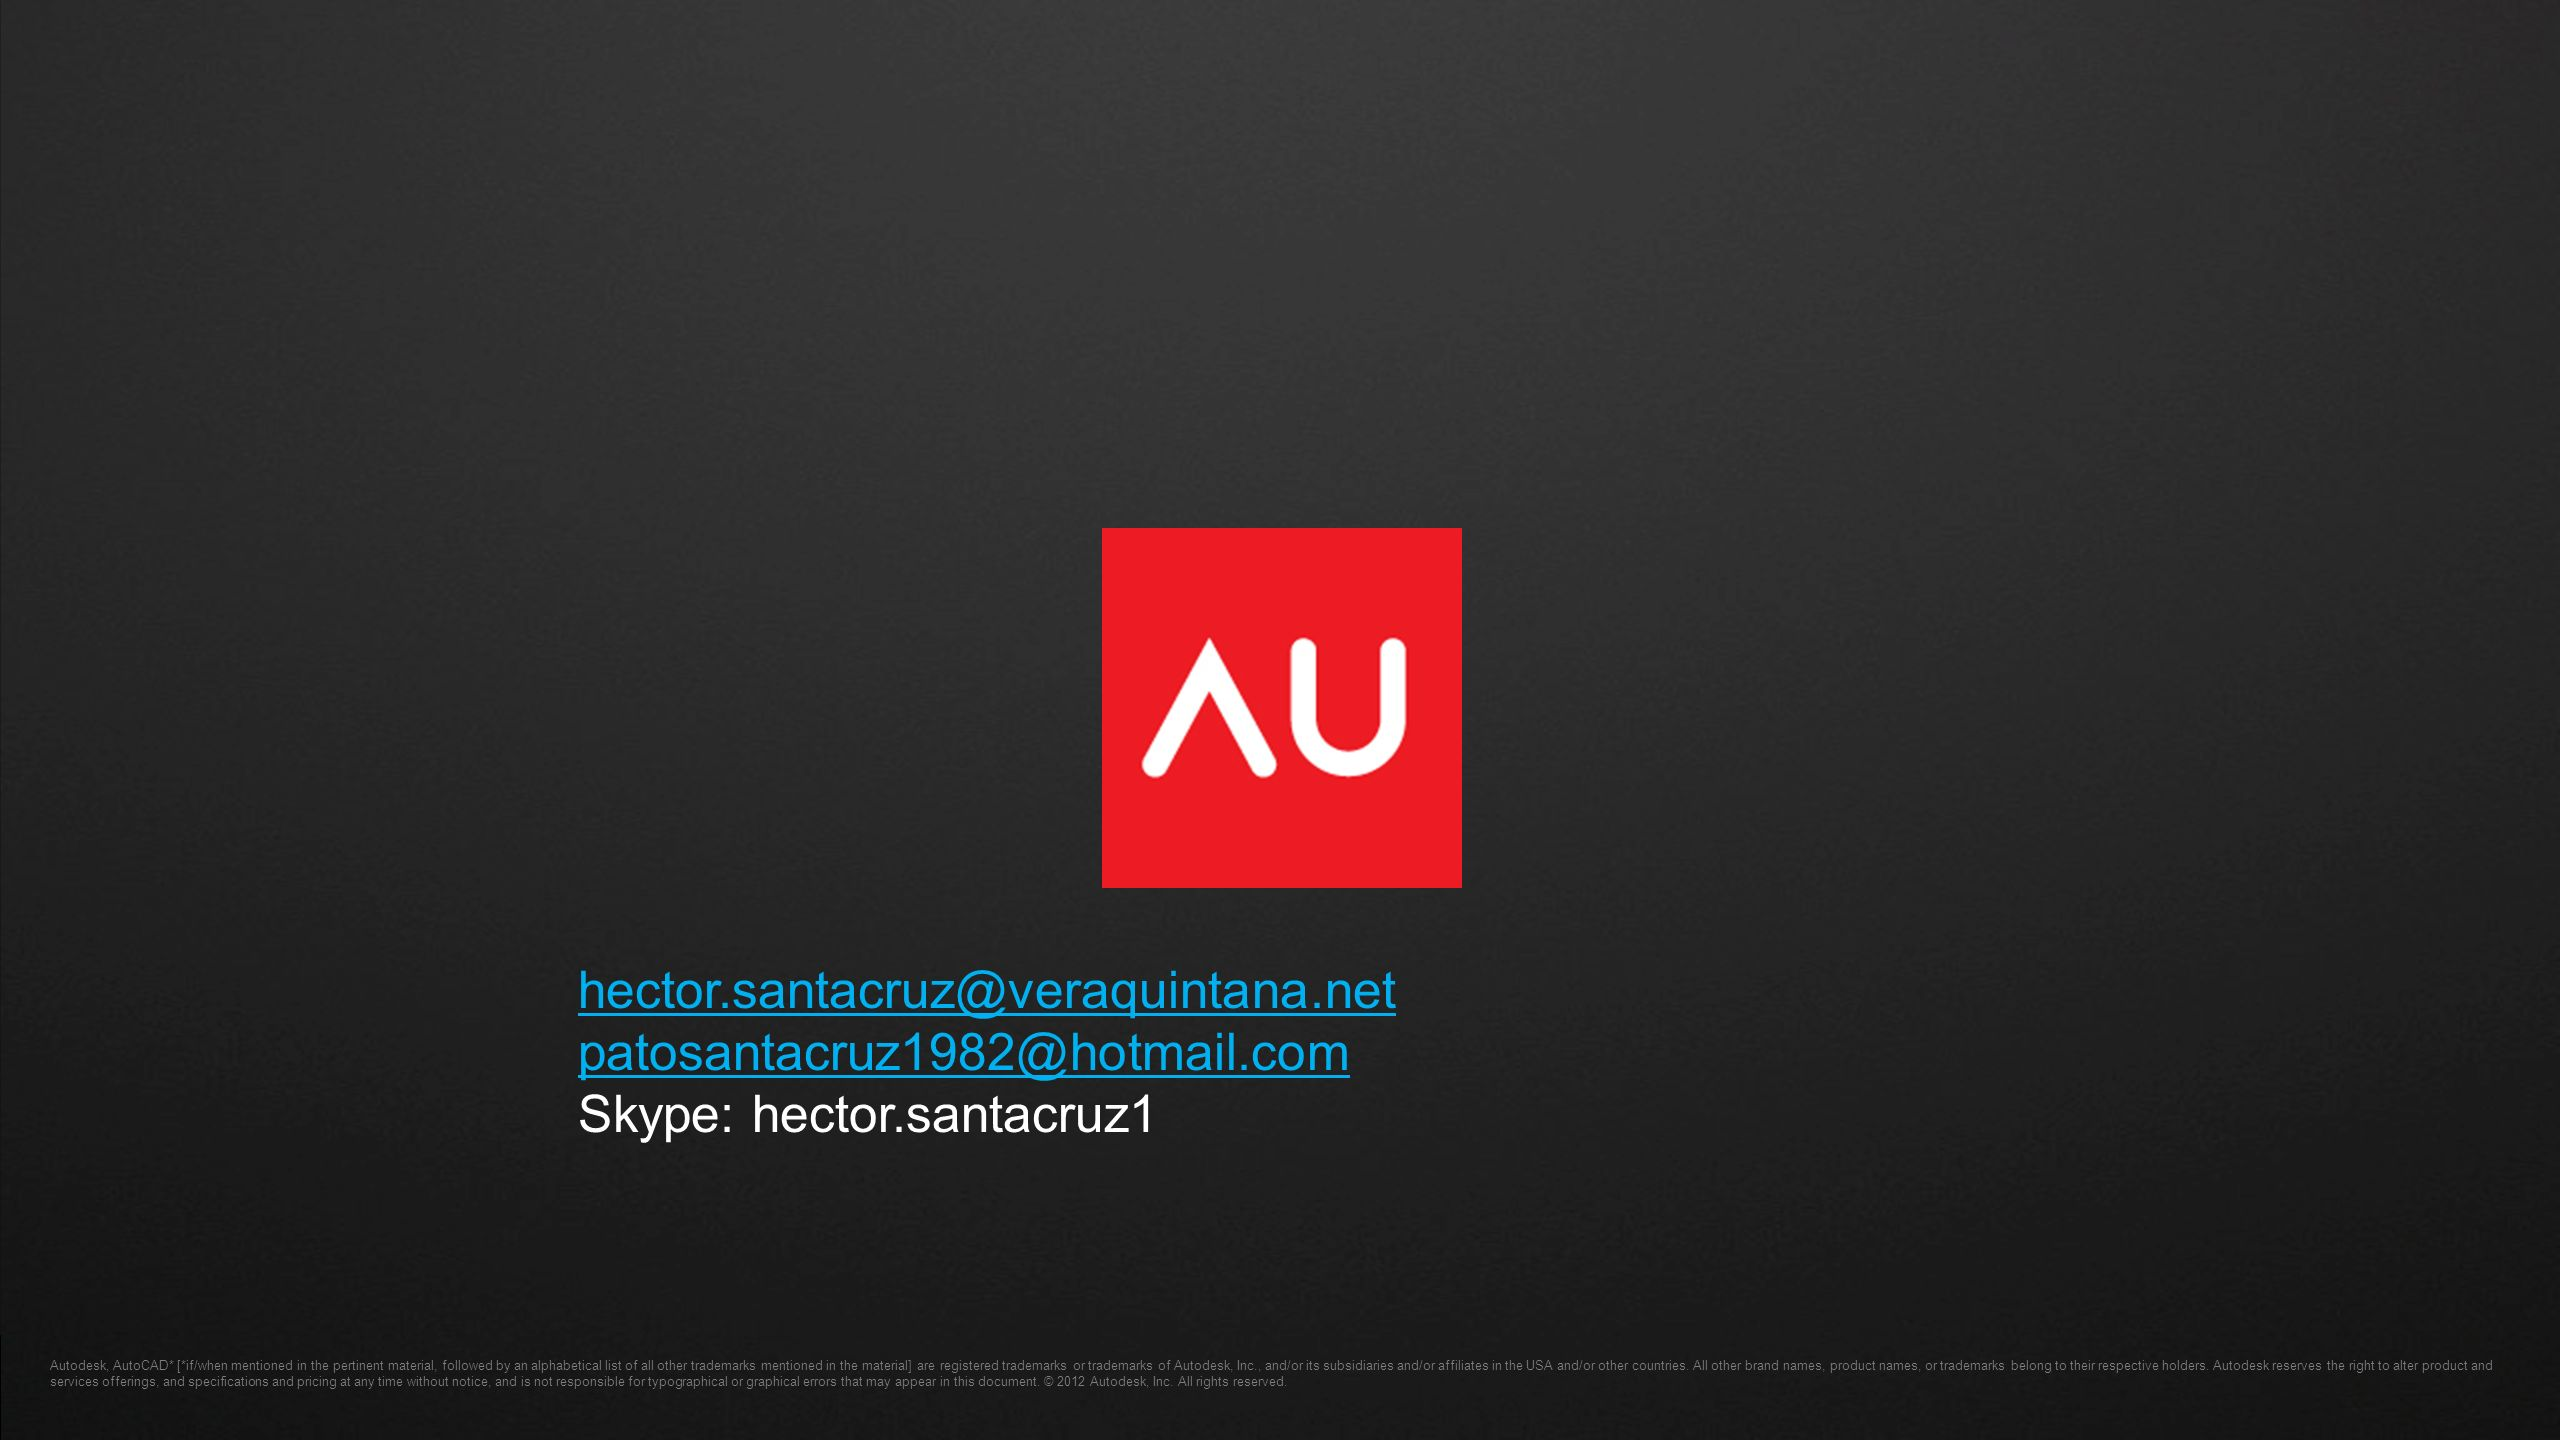 Skype: hector.santacruz1